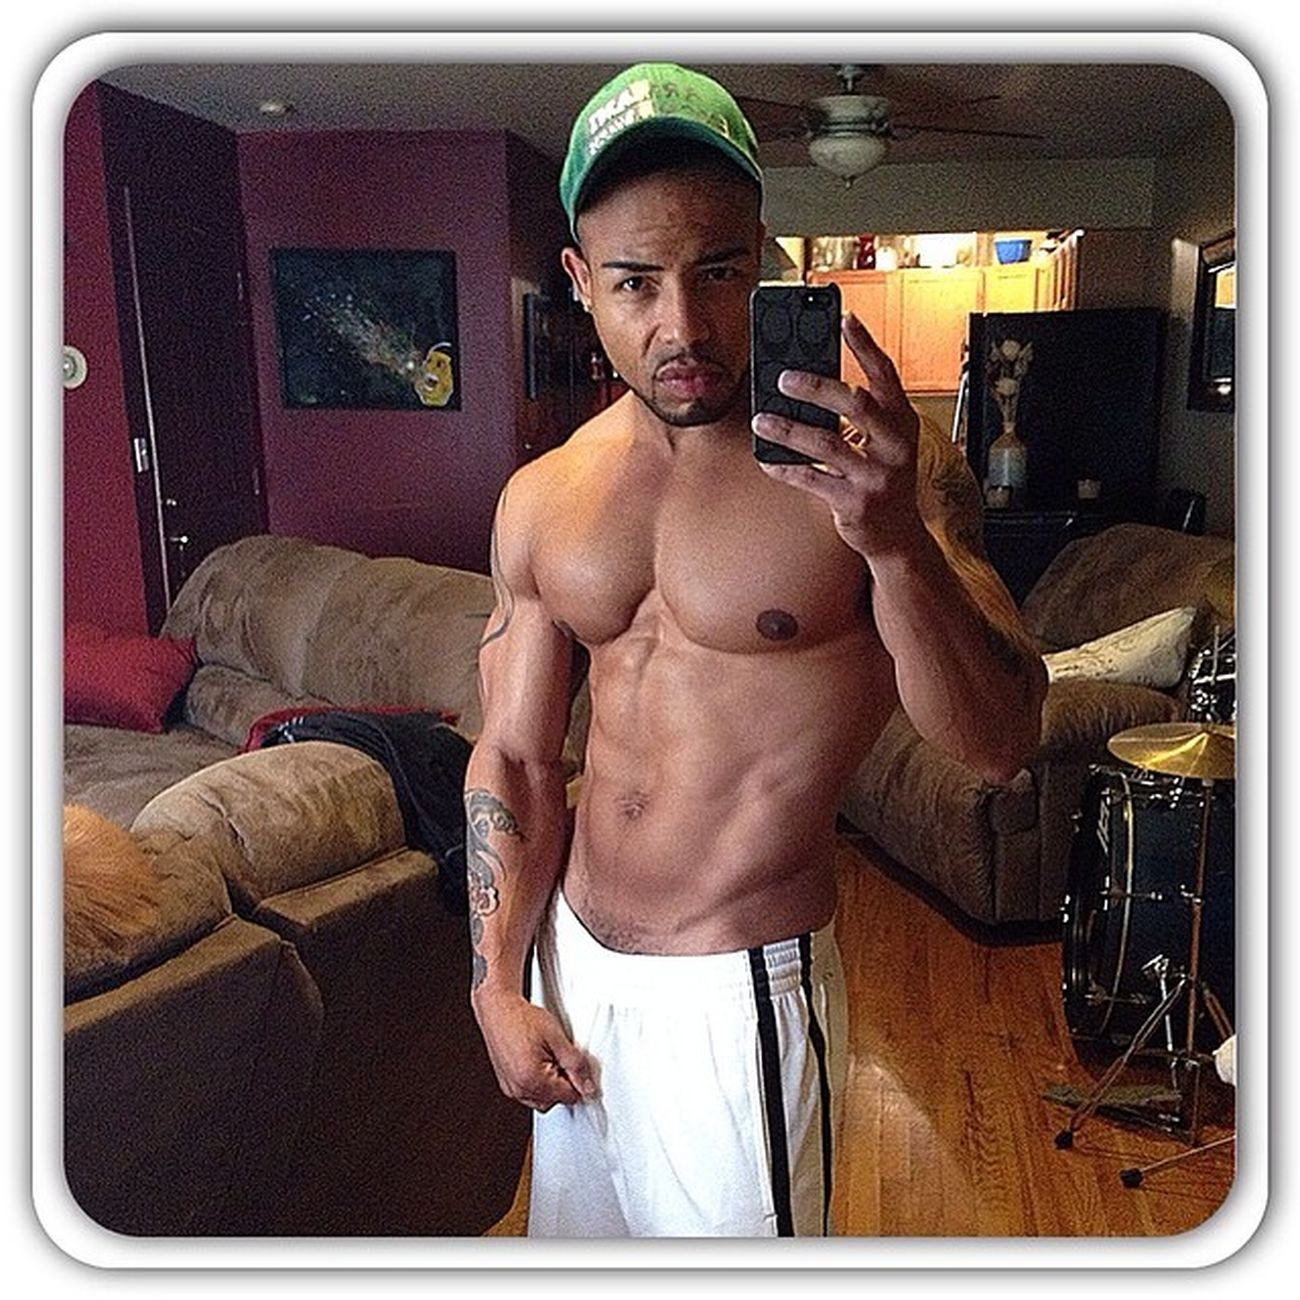 GymGrindSelfie Selfie WorkoutModeOn Grr nodaysoff hardcore meanmuggin muscleman musclebodyineffect muscle body ??